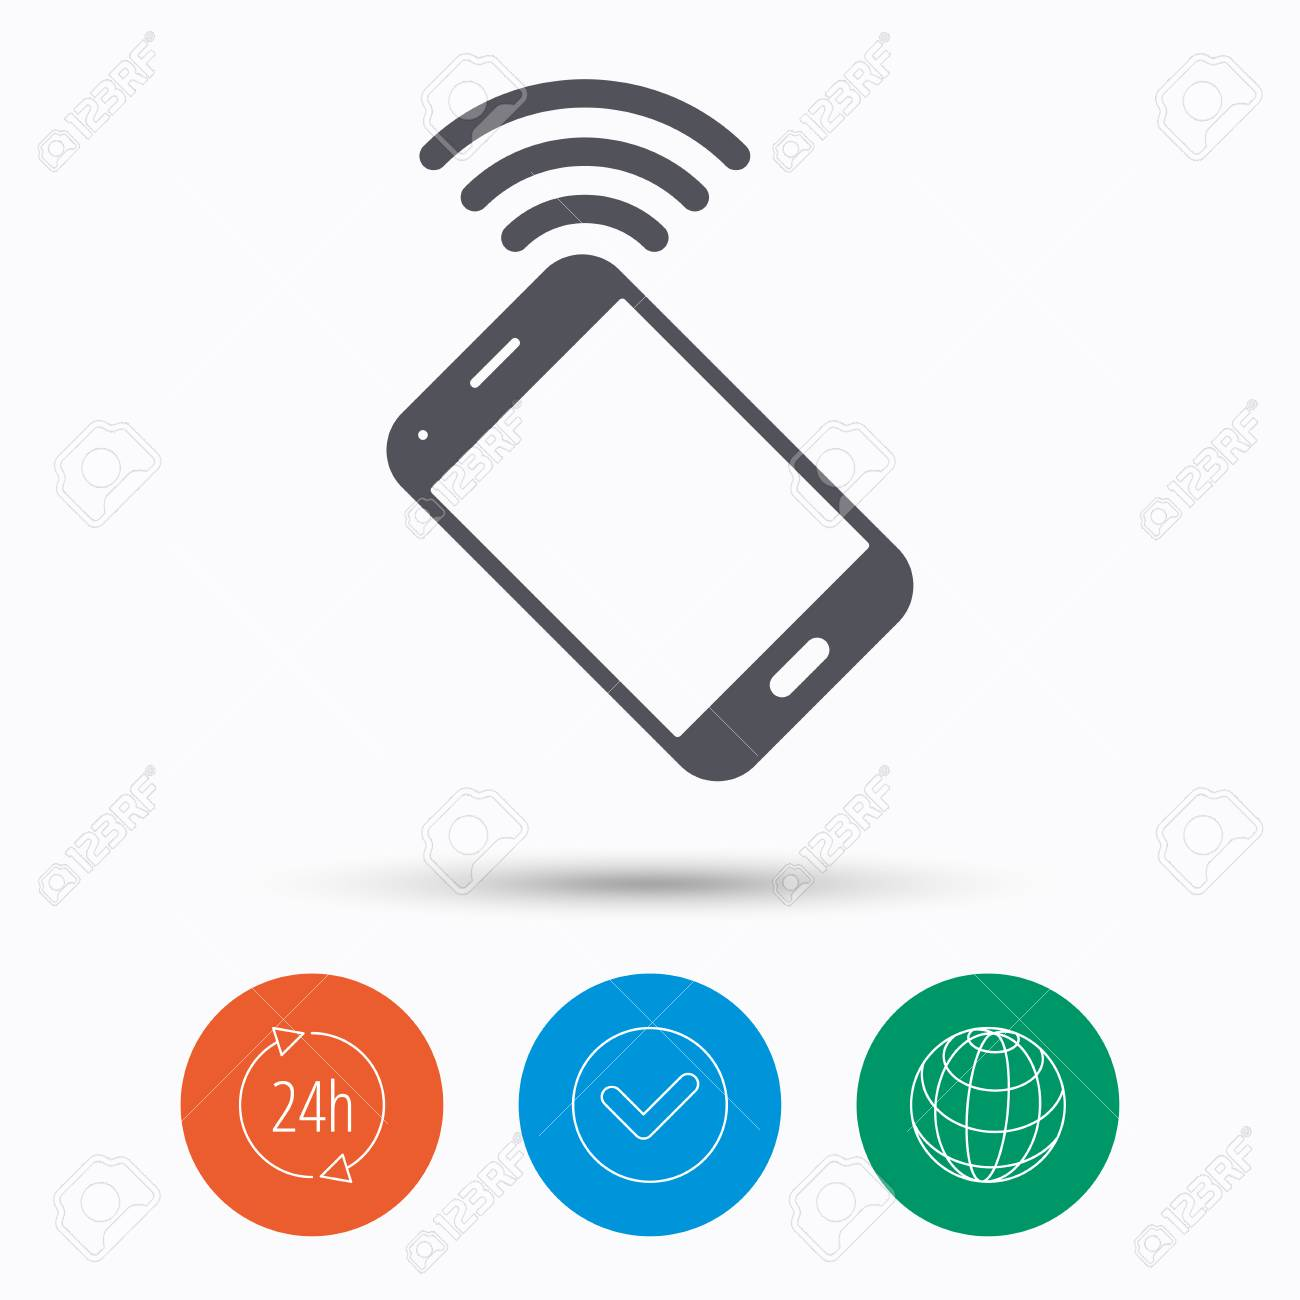 Cellphone icon  Mobile phone communication symbol  Check tick,